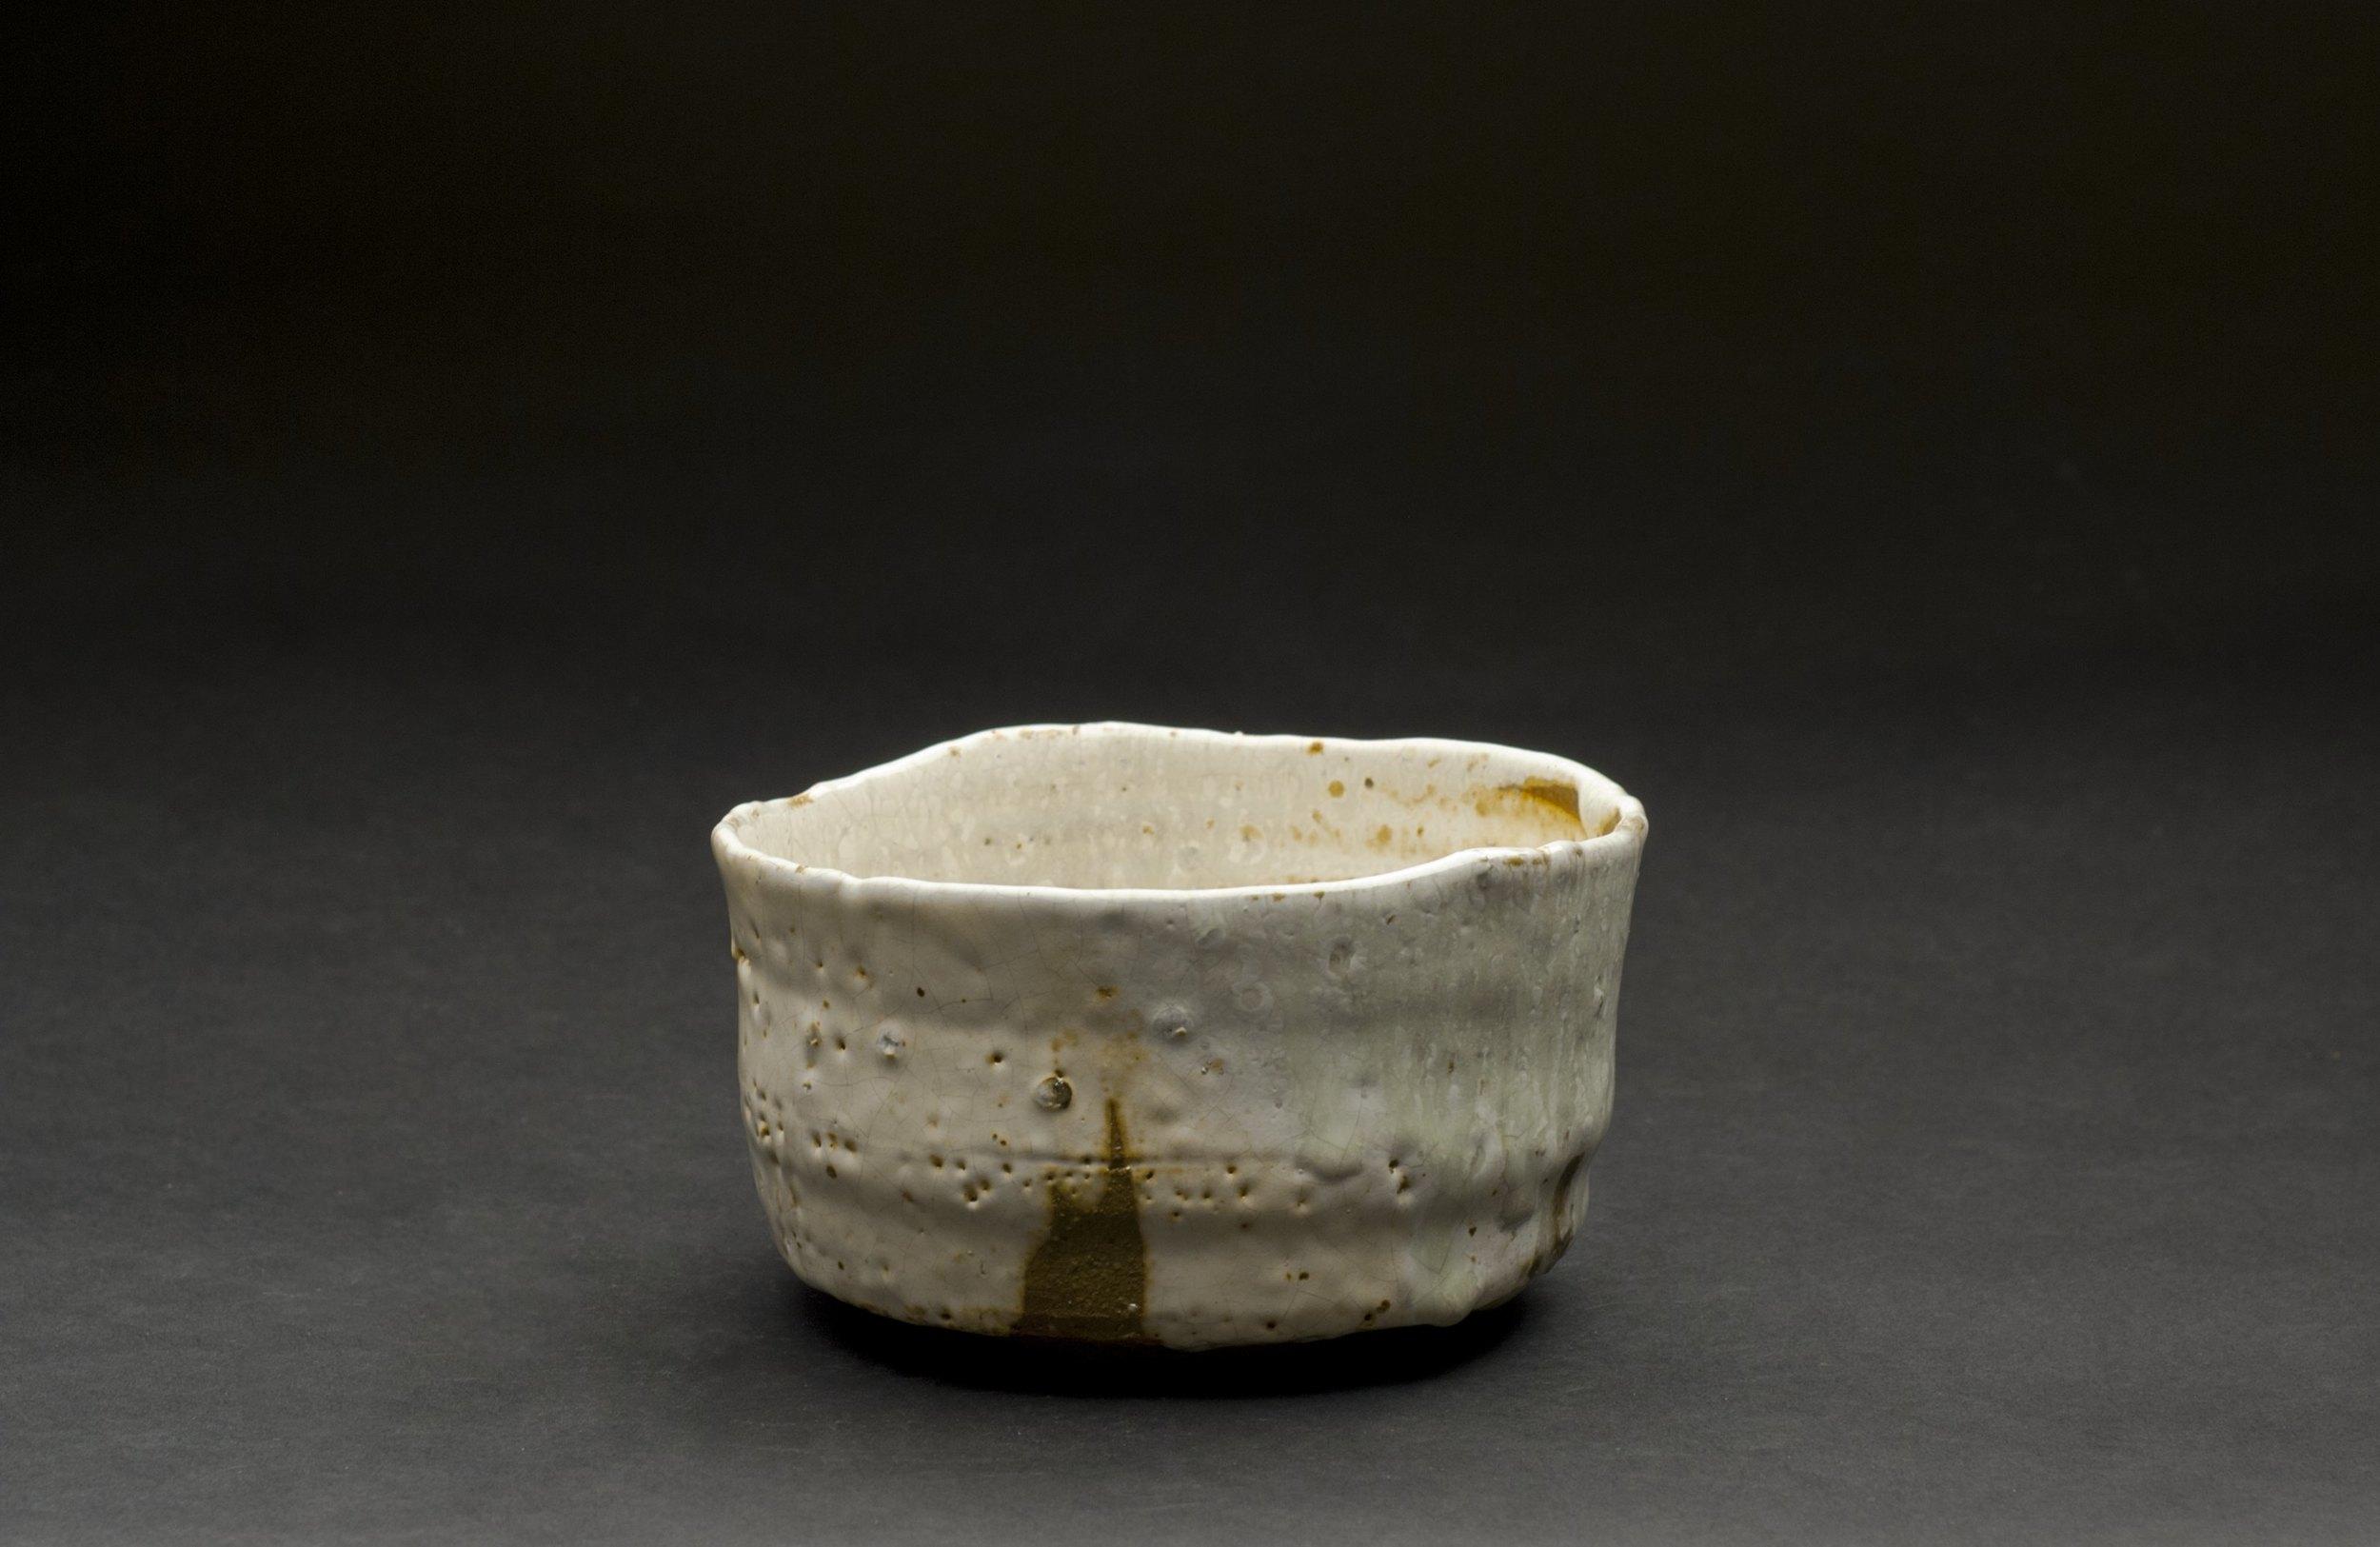 Mike Weber    Matcha Chawan  , 2012 Woodfired clay 3 x 5.25 x 5 inches / 7.6 x 13.3 x 12.7 cm / MWe 8